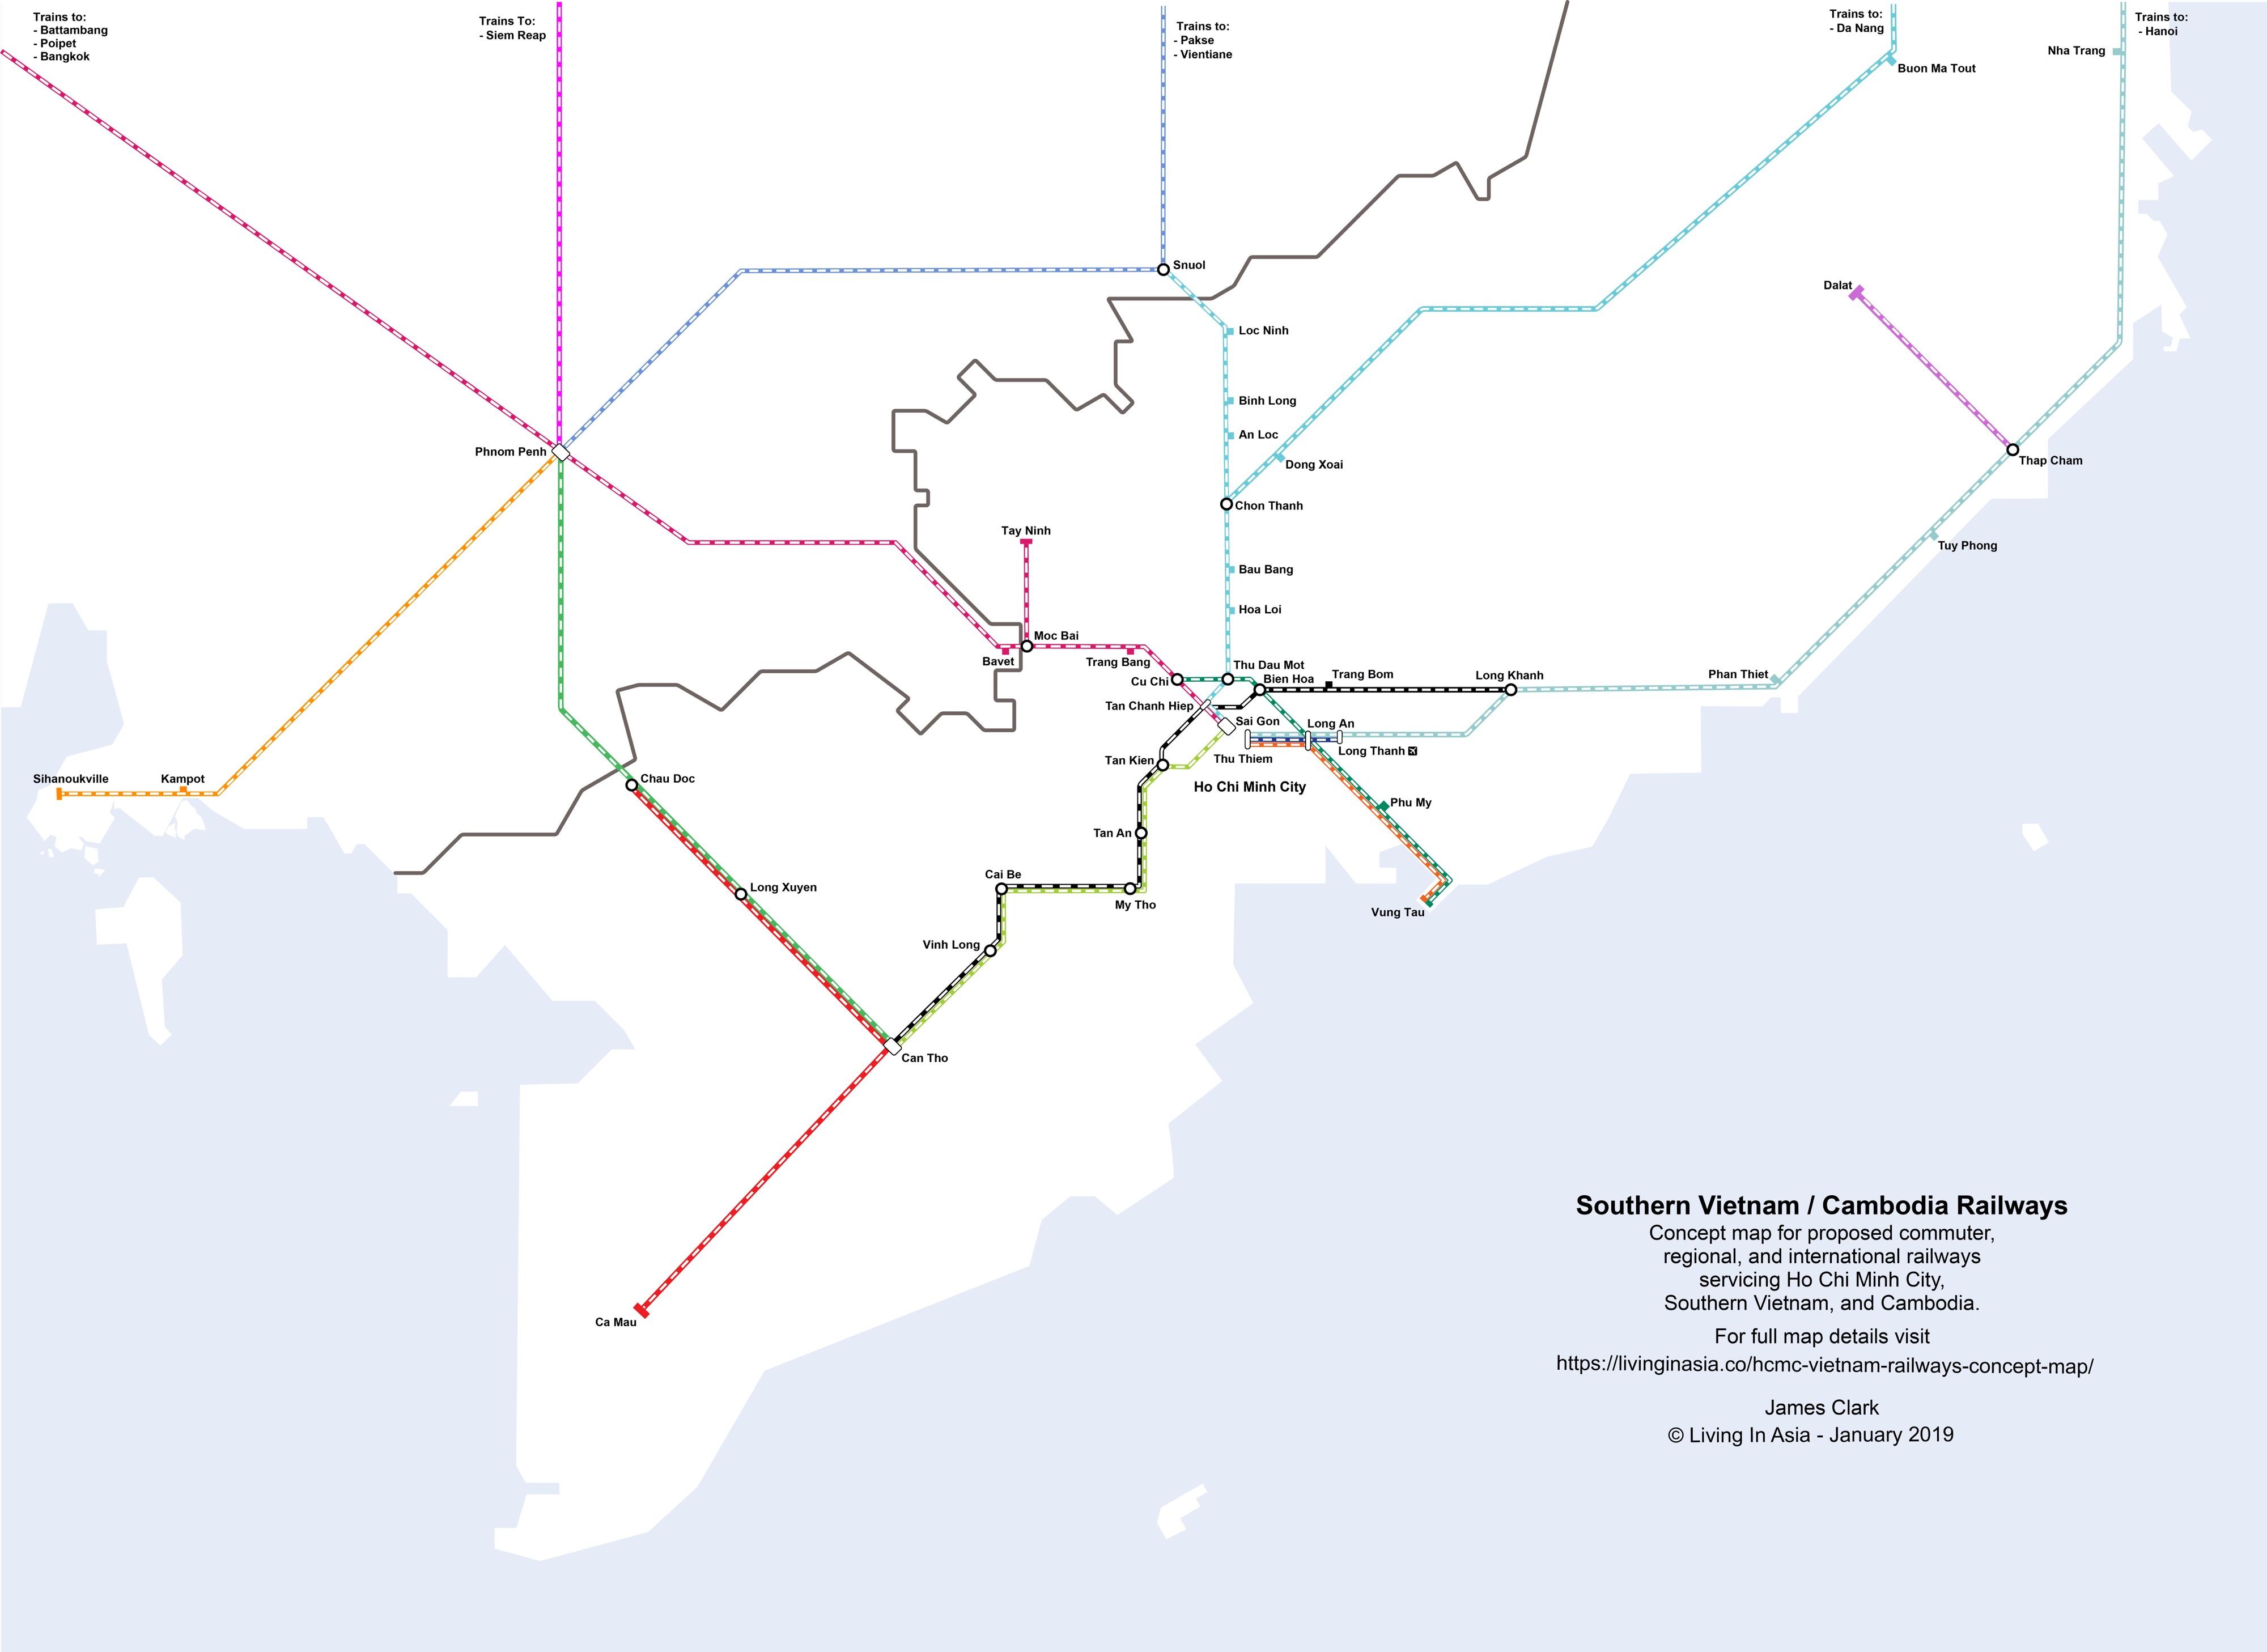 Tokyo Vincity Subway Map.Ho Chi Minh City Metro Concept Map